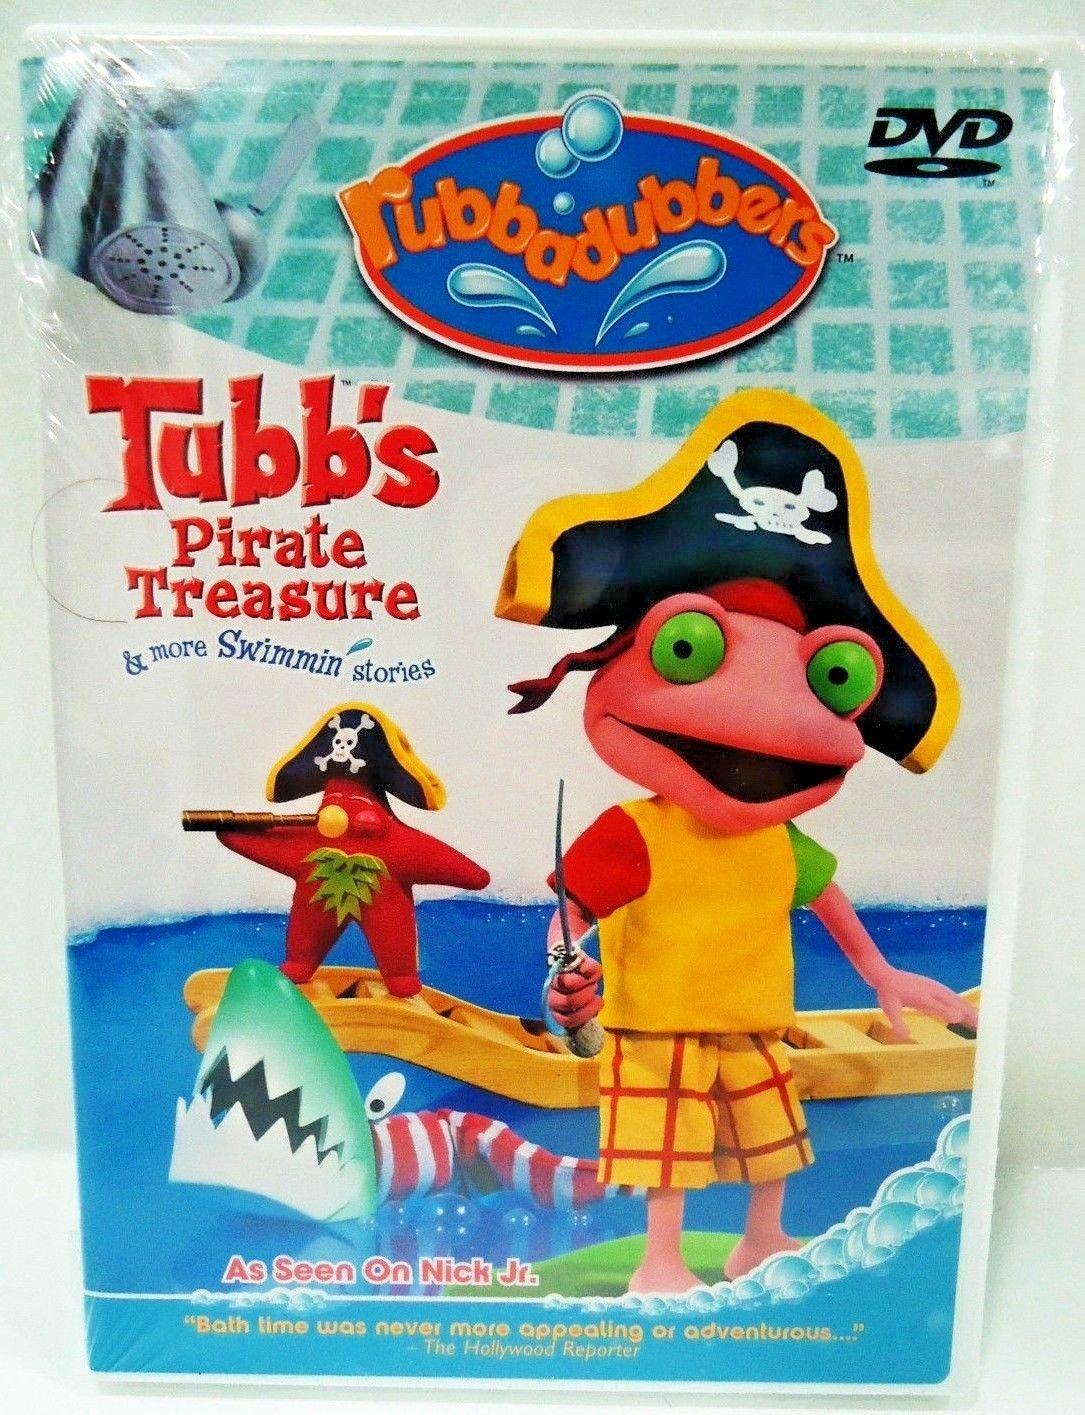 RUBBADUBBERS - TUBB'S PIRATE TREASURE - DVD - NEW - SEALED - NICK JR. - CARTOON